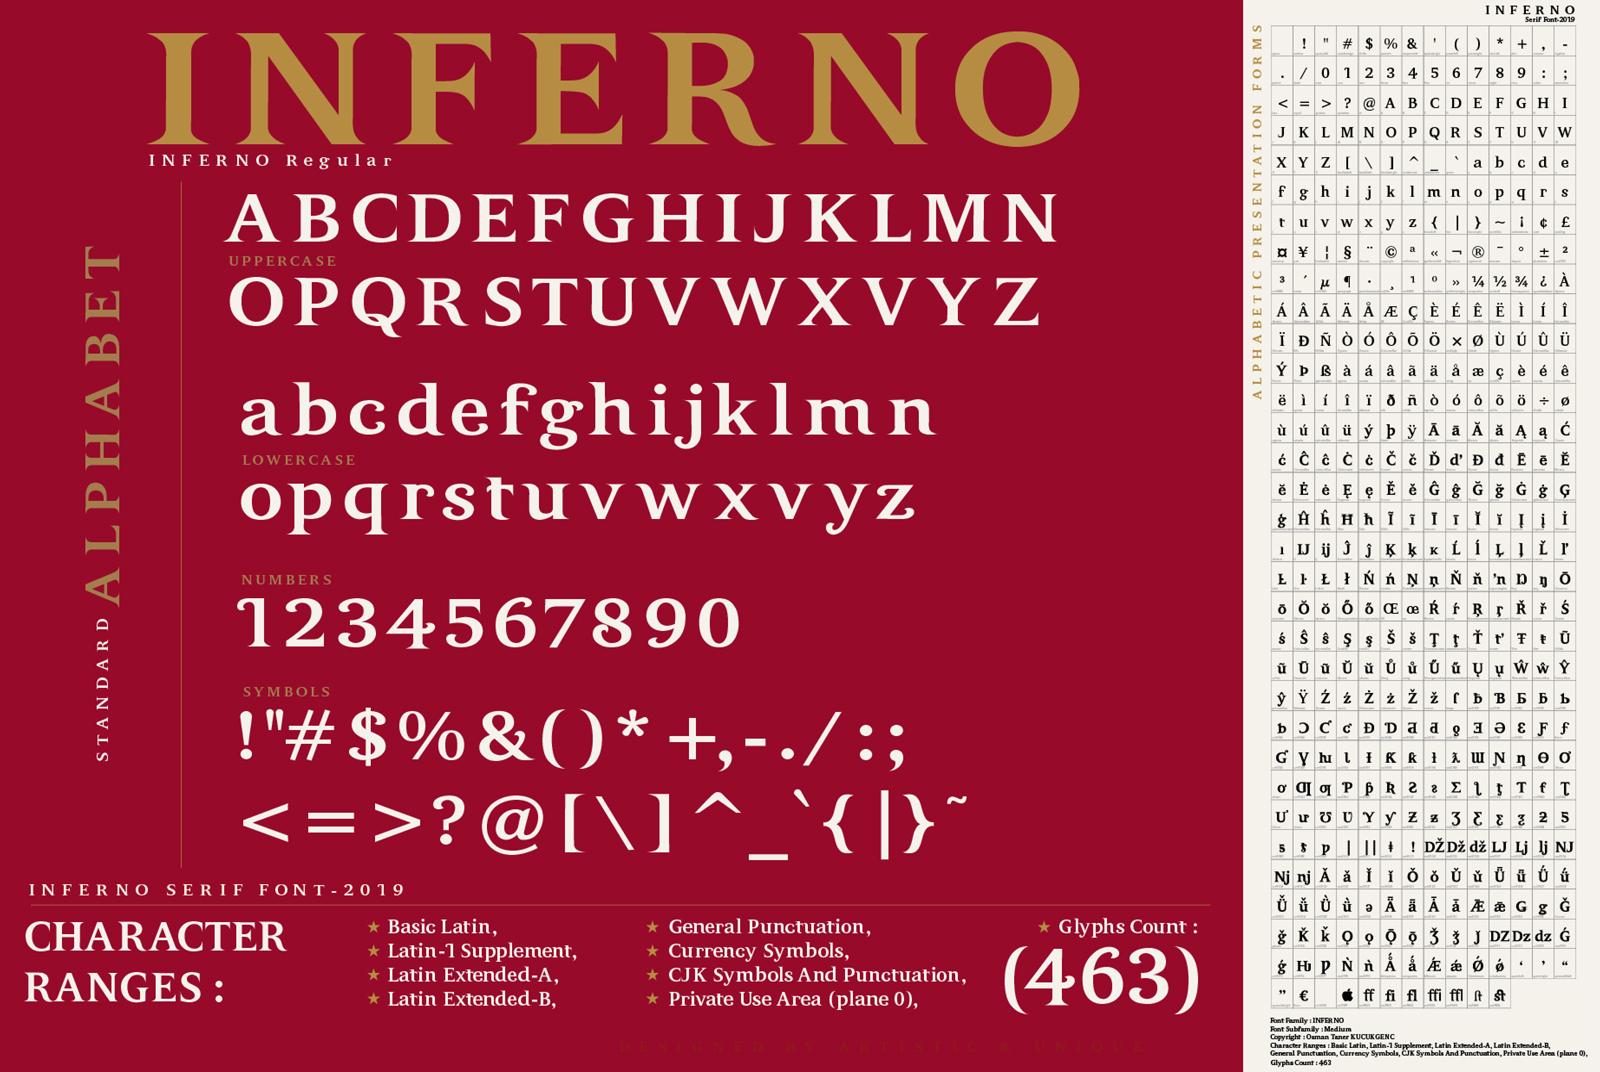 INFERNO Serif font example image 4